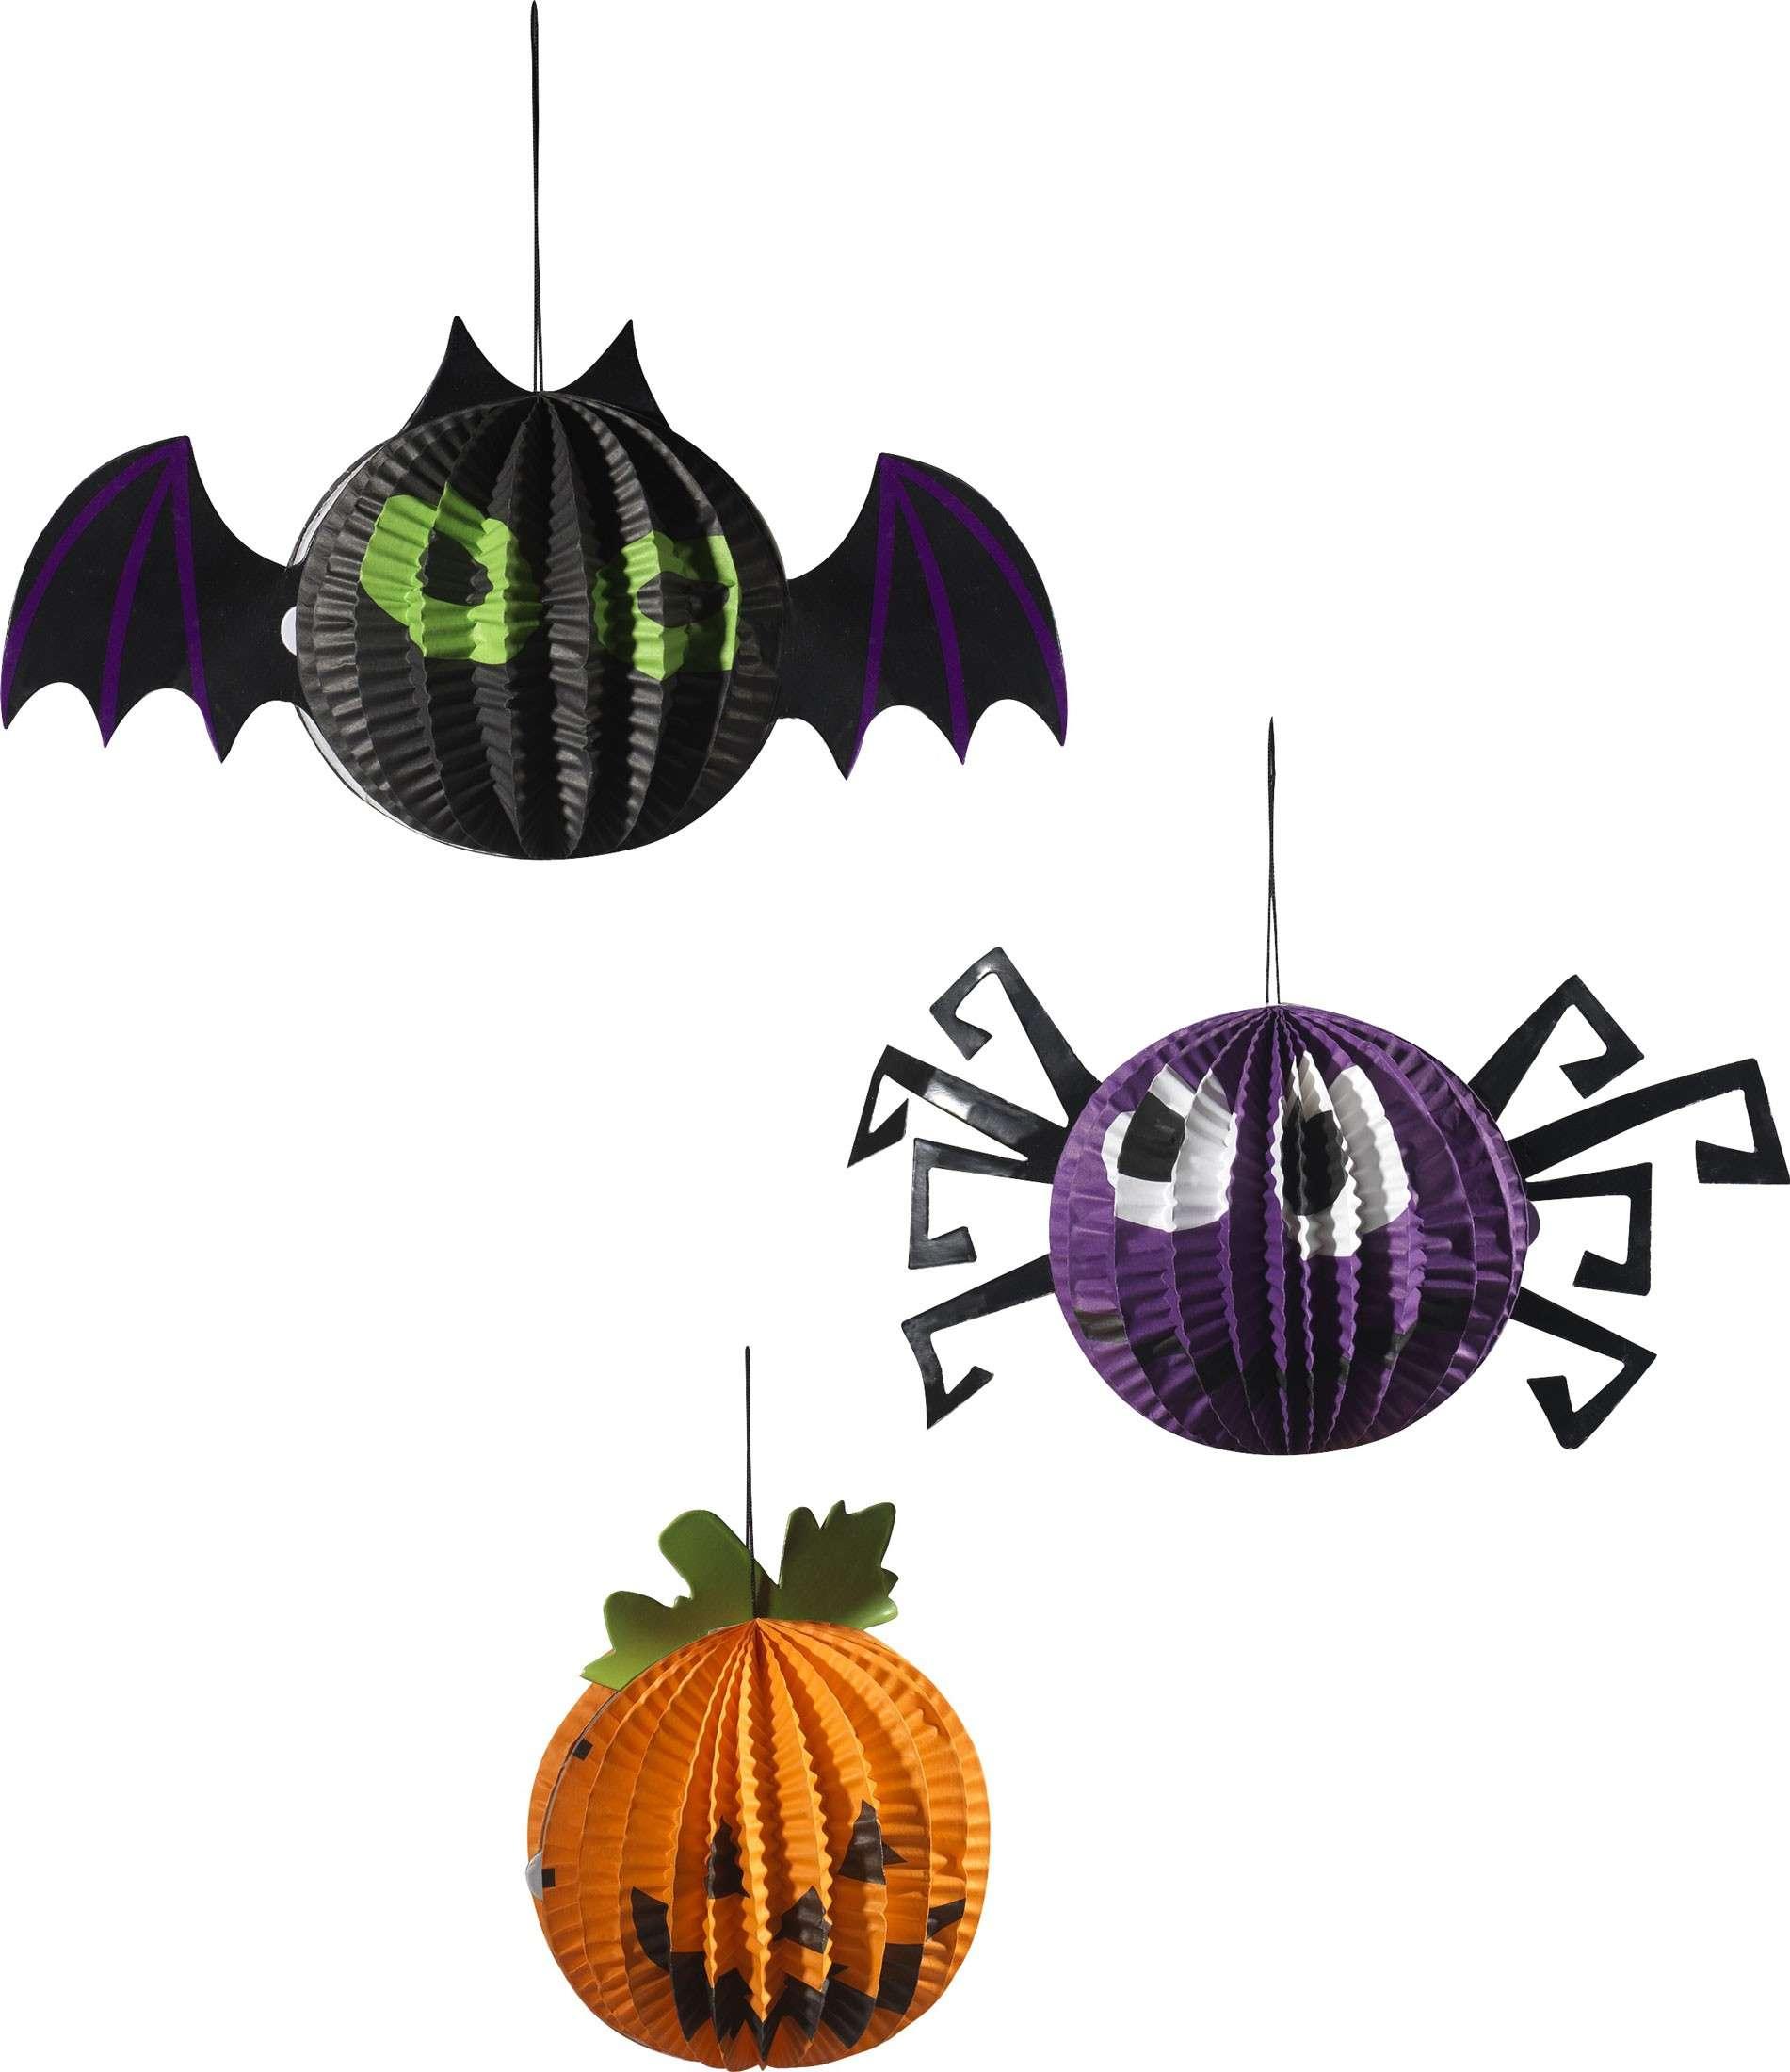 happy halloween geschoepfe haengedekoration 3 teilig 14ImLmokUOj26C 1280x1280 2x